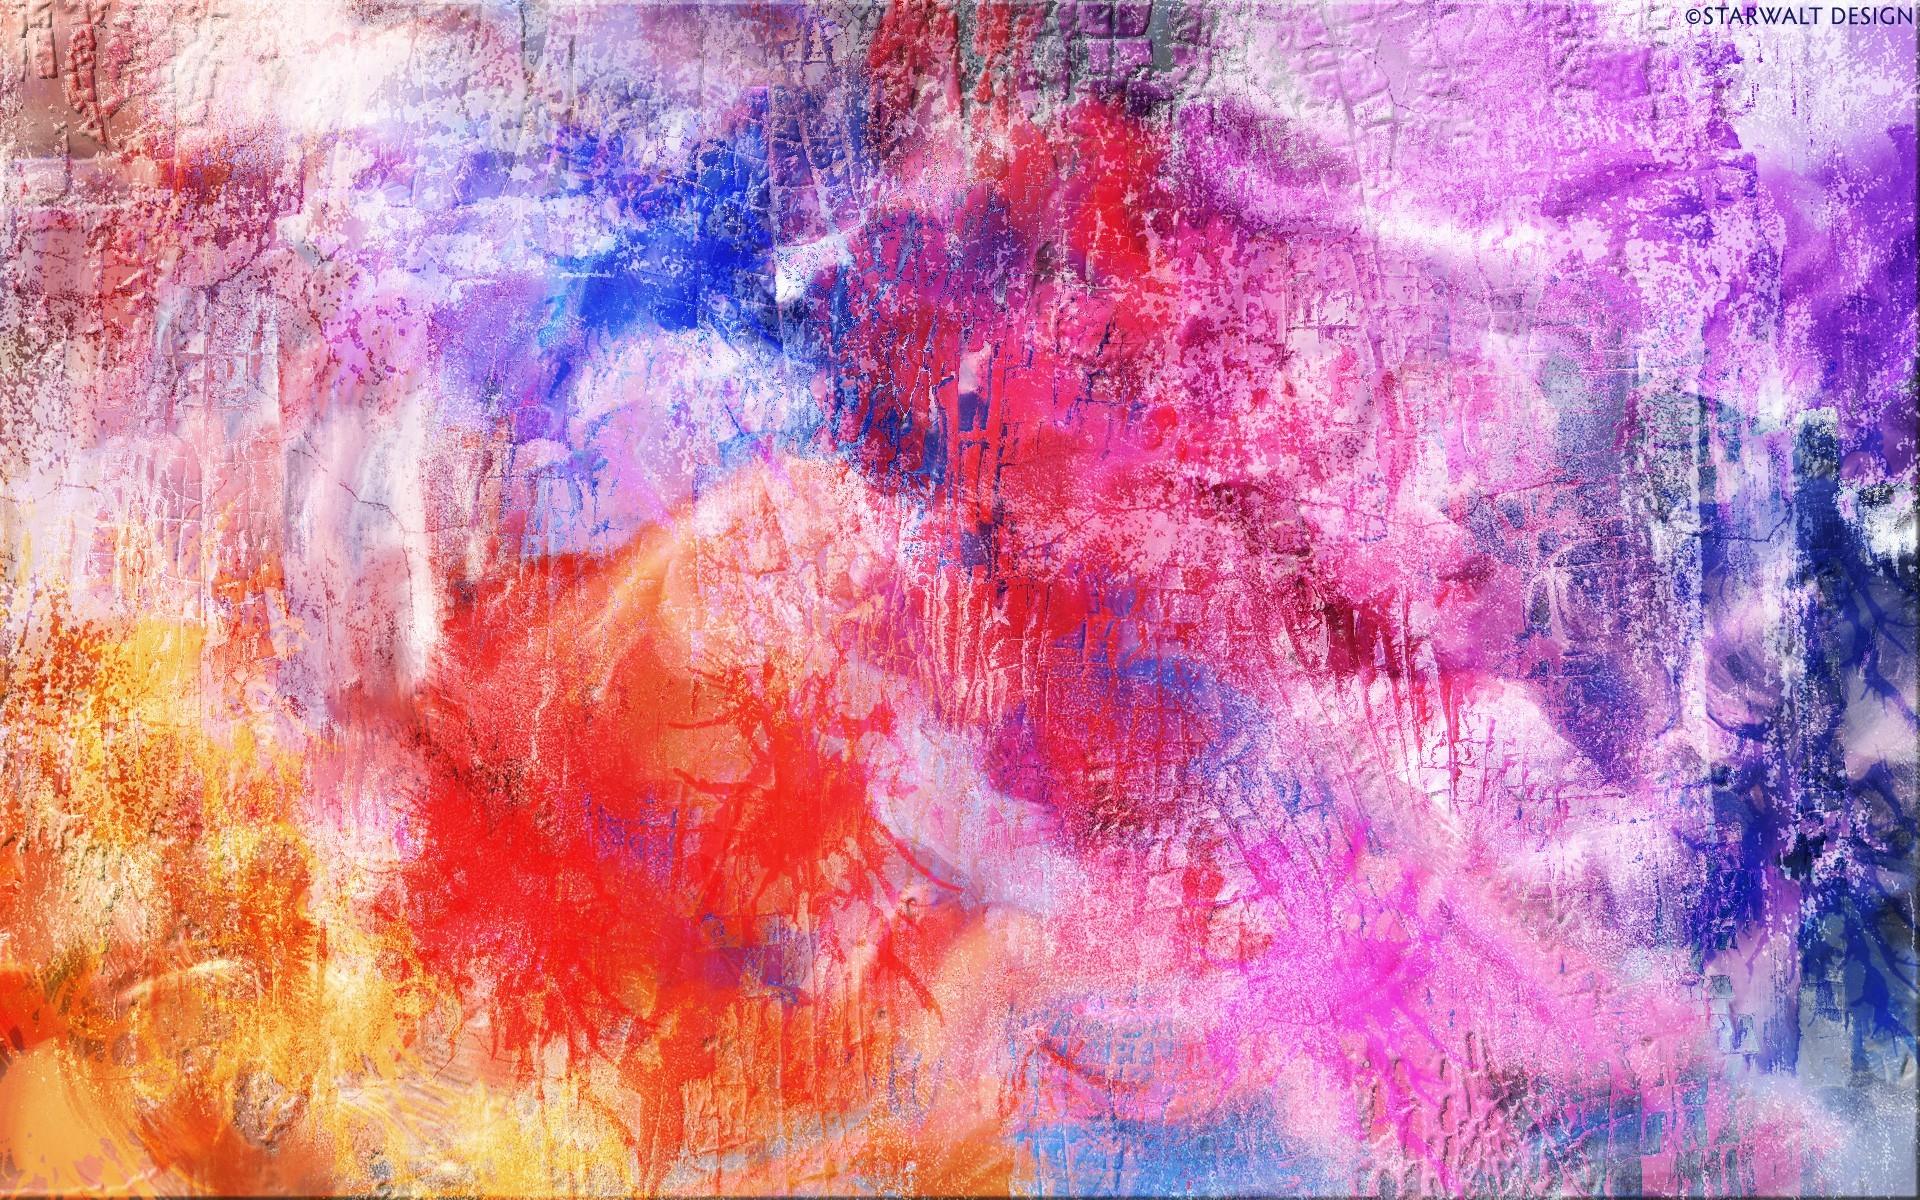 1920x1200 Abstract Digital Art wallpapers HD free - 562445 · Download · Modern ...